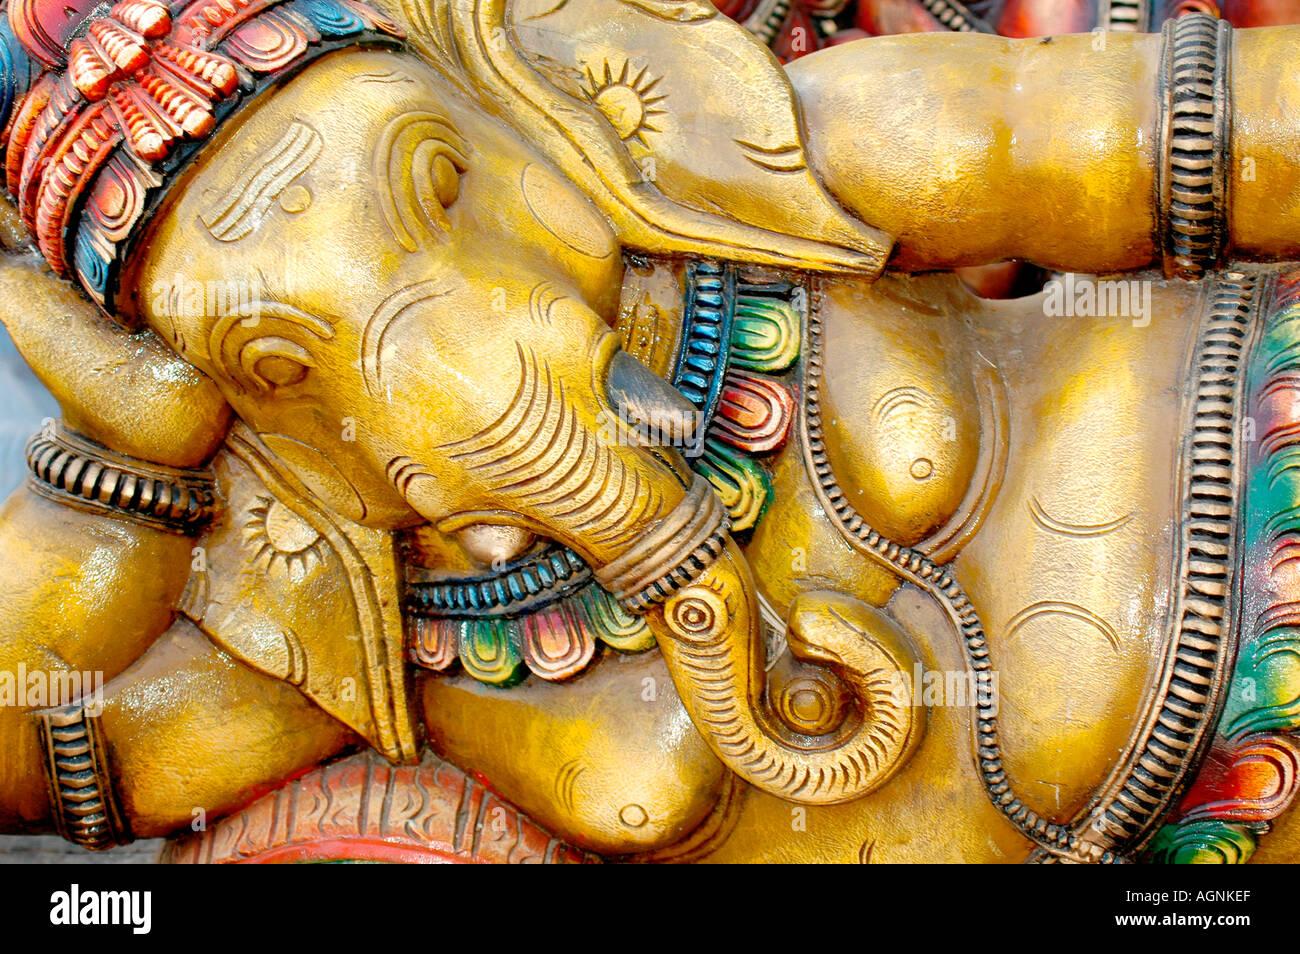 Lord Ganesha mythology Indian deity colorful Wooden Sculpture souvenir handicraft memento - Stock Image